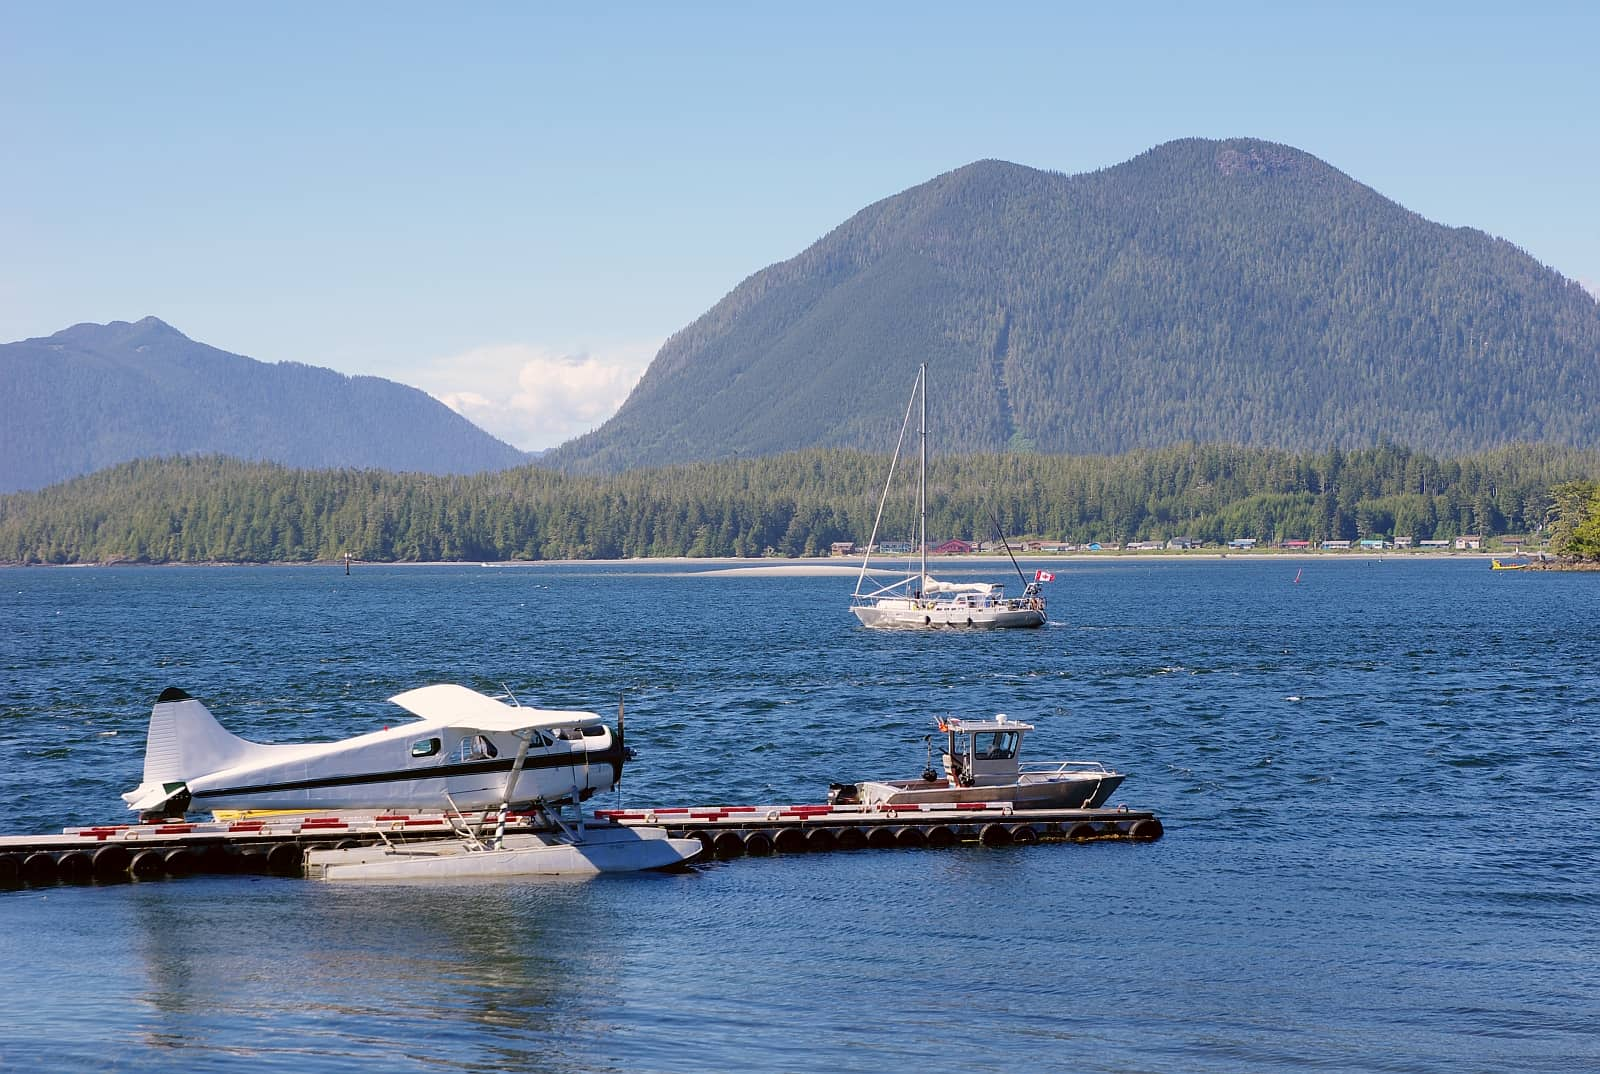 Tofino, Vancouver Island, British Columbia.